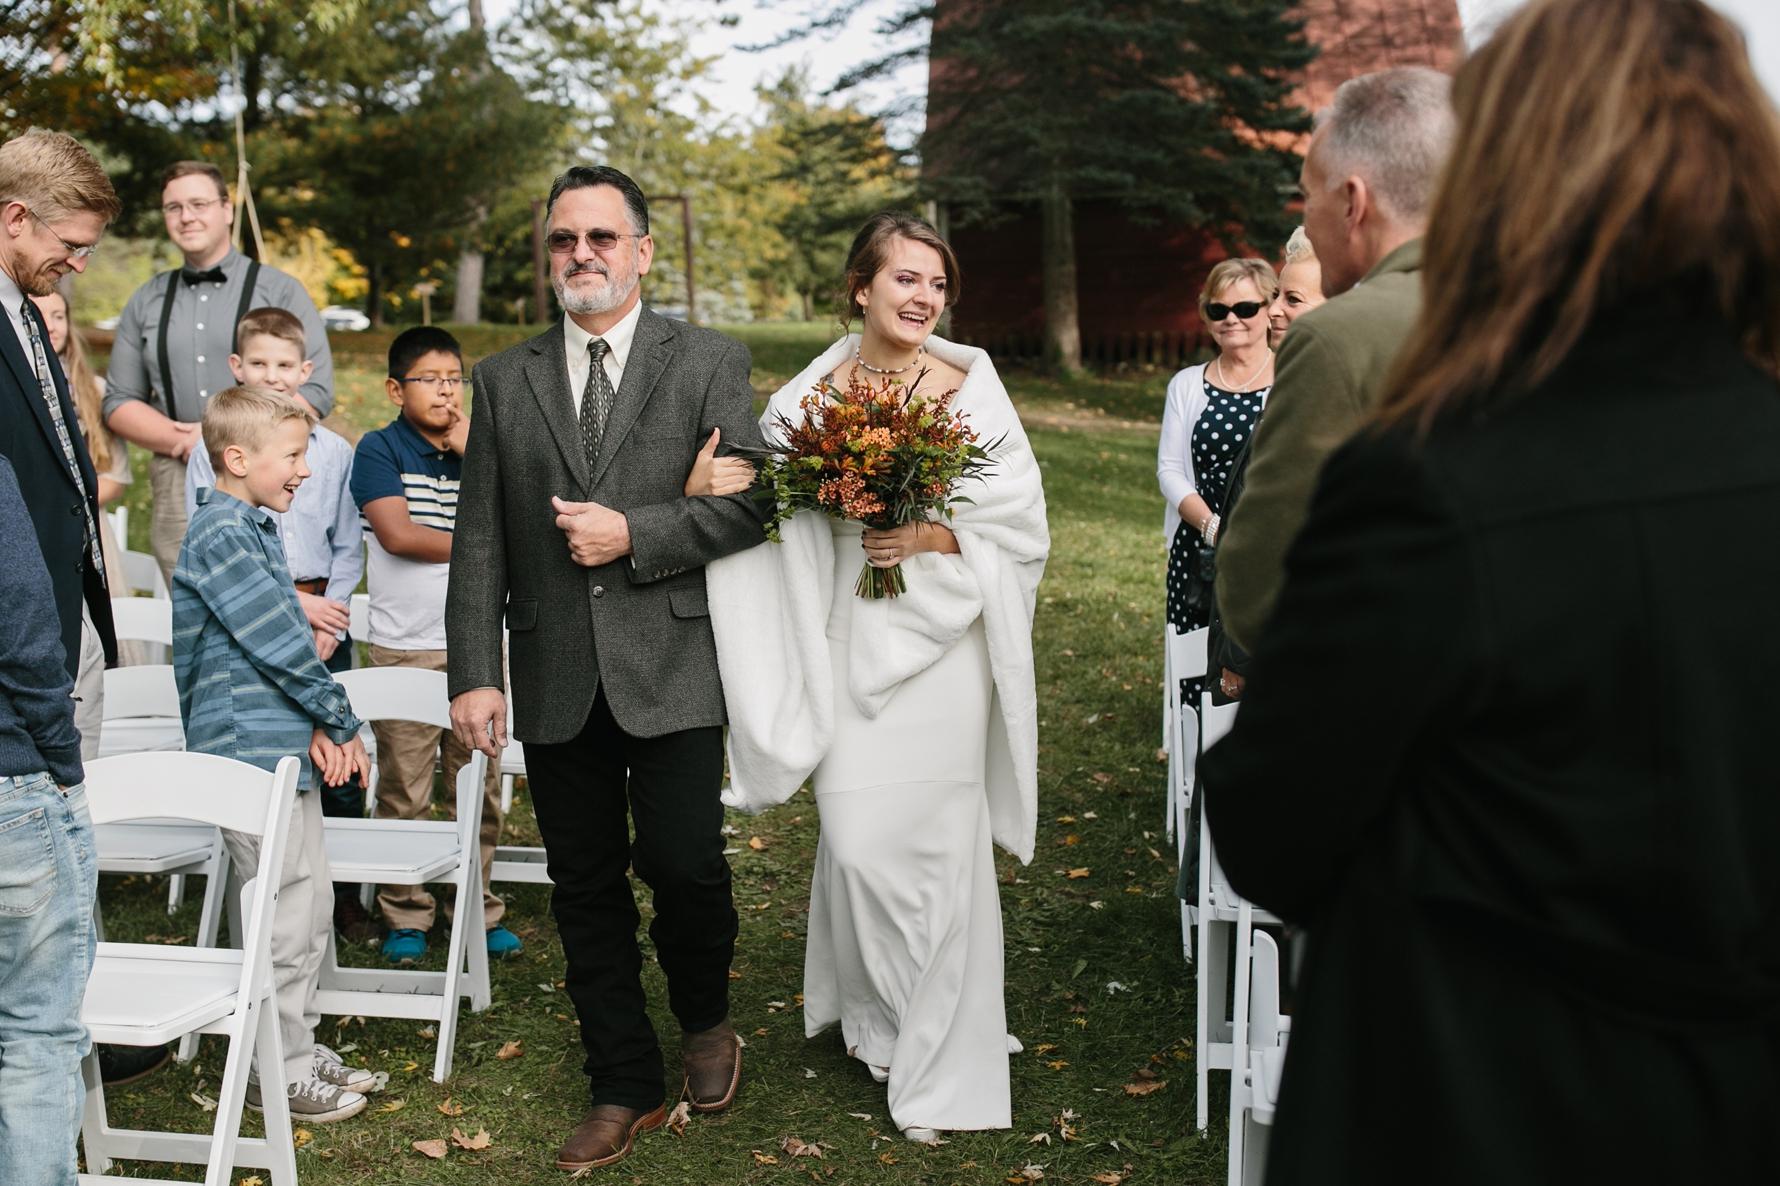 norris-traverse-city-wedding-43.JPG